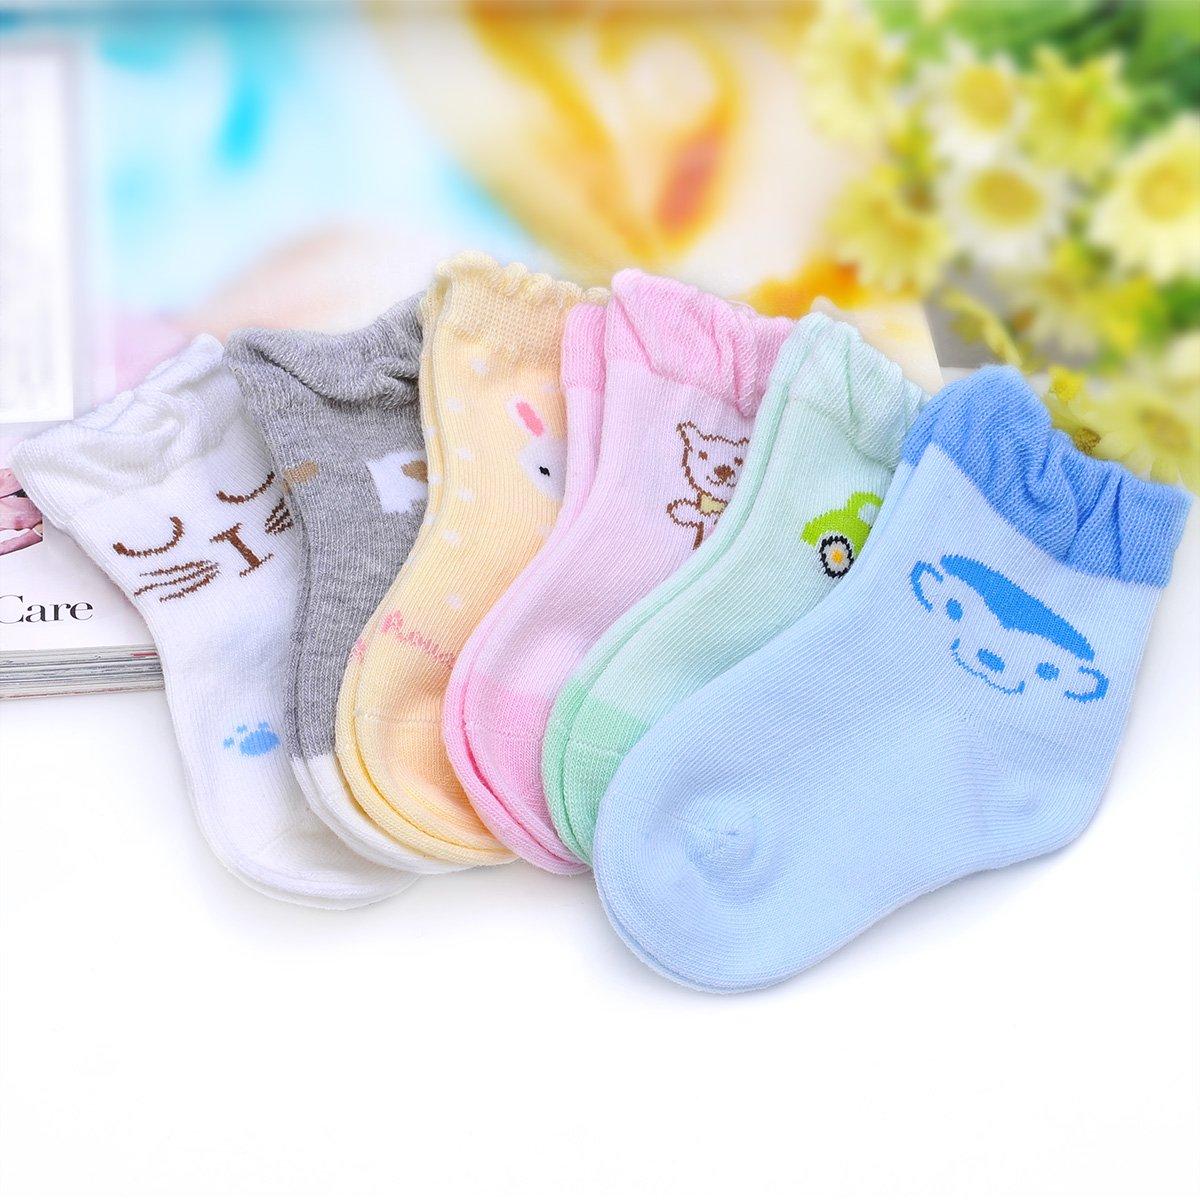 Ezclassy- Girls\' 12 Pack Crew Socks (0-1 Years)